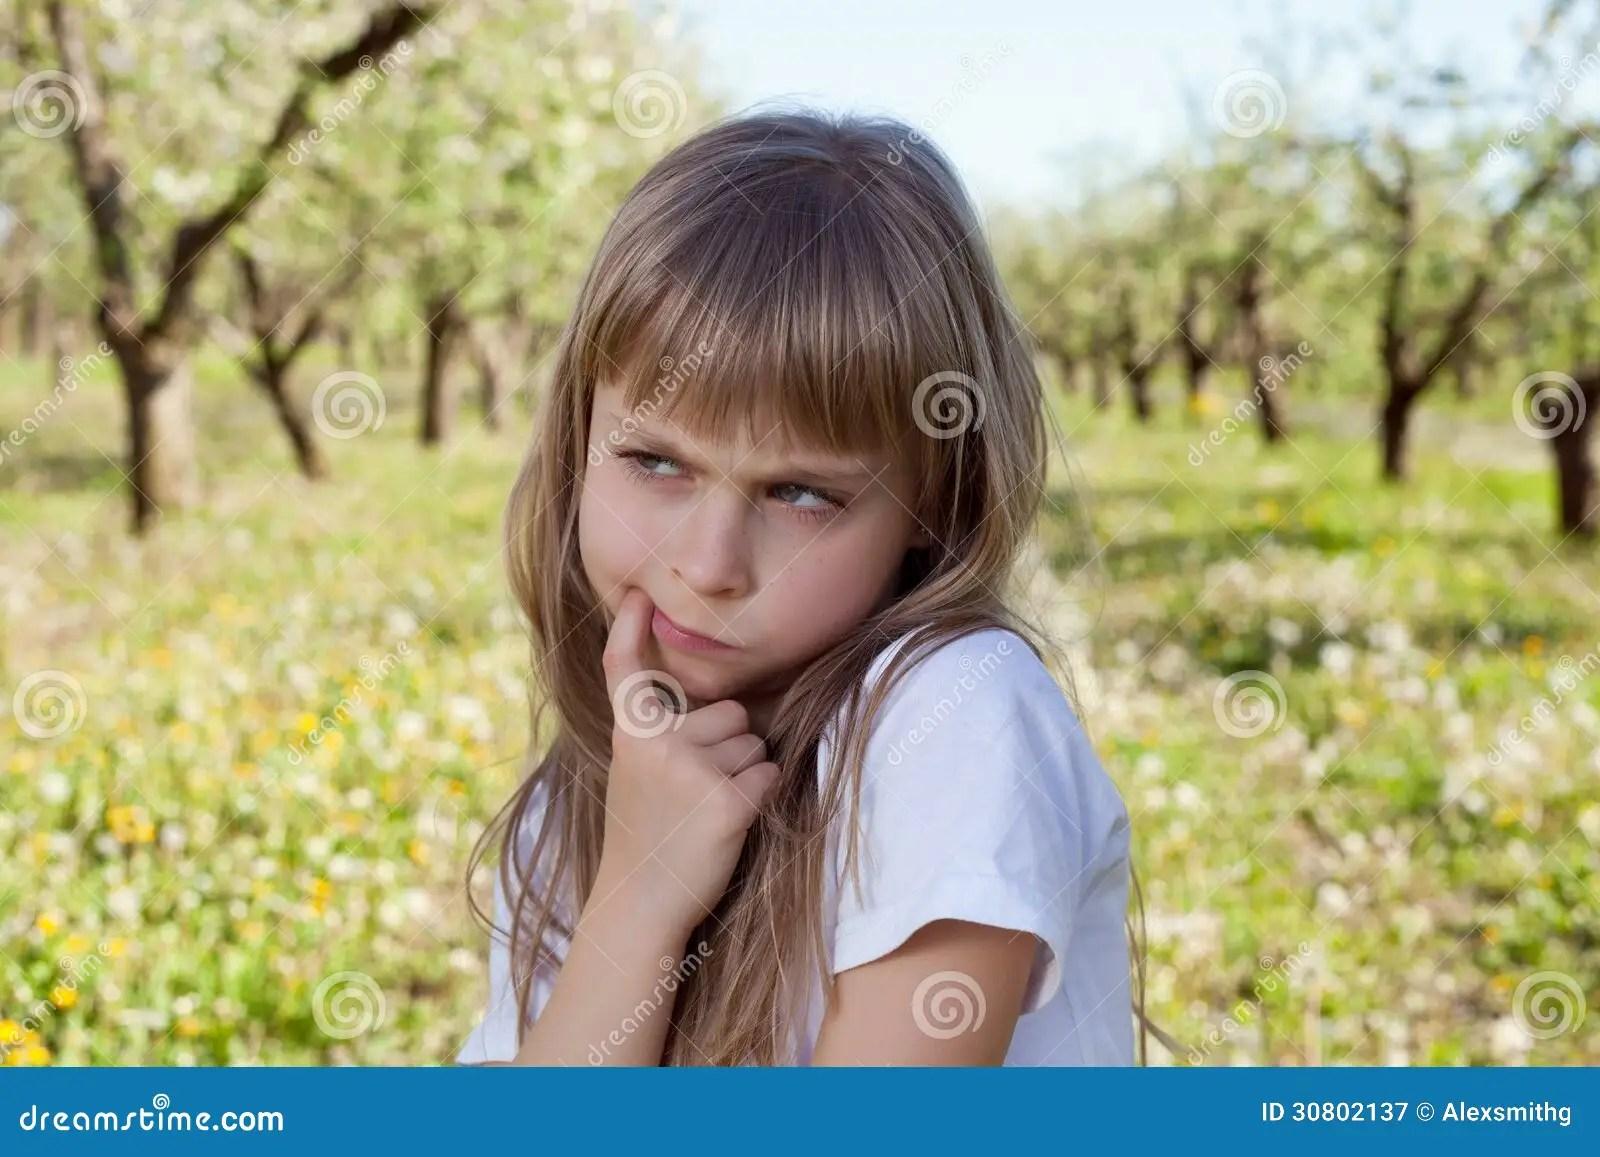 Alone Girl Wallpaper Mobile9 Pics Of Cute Sad Girls Impremedia Net